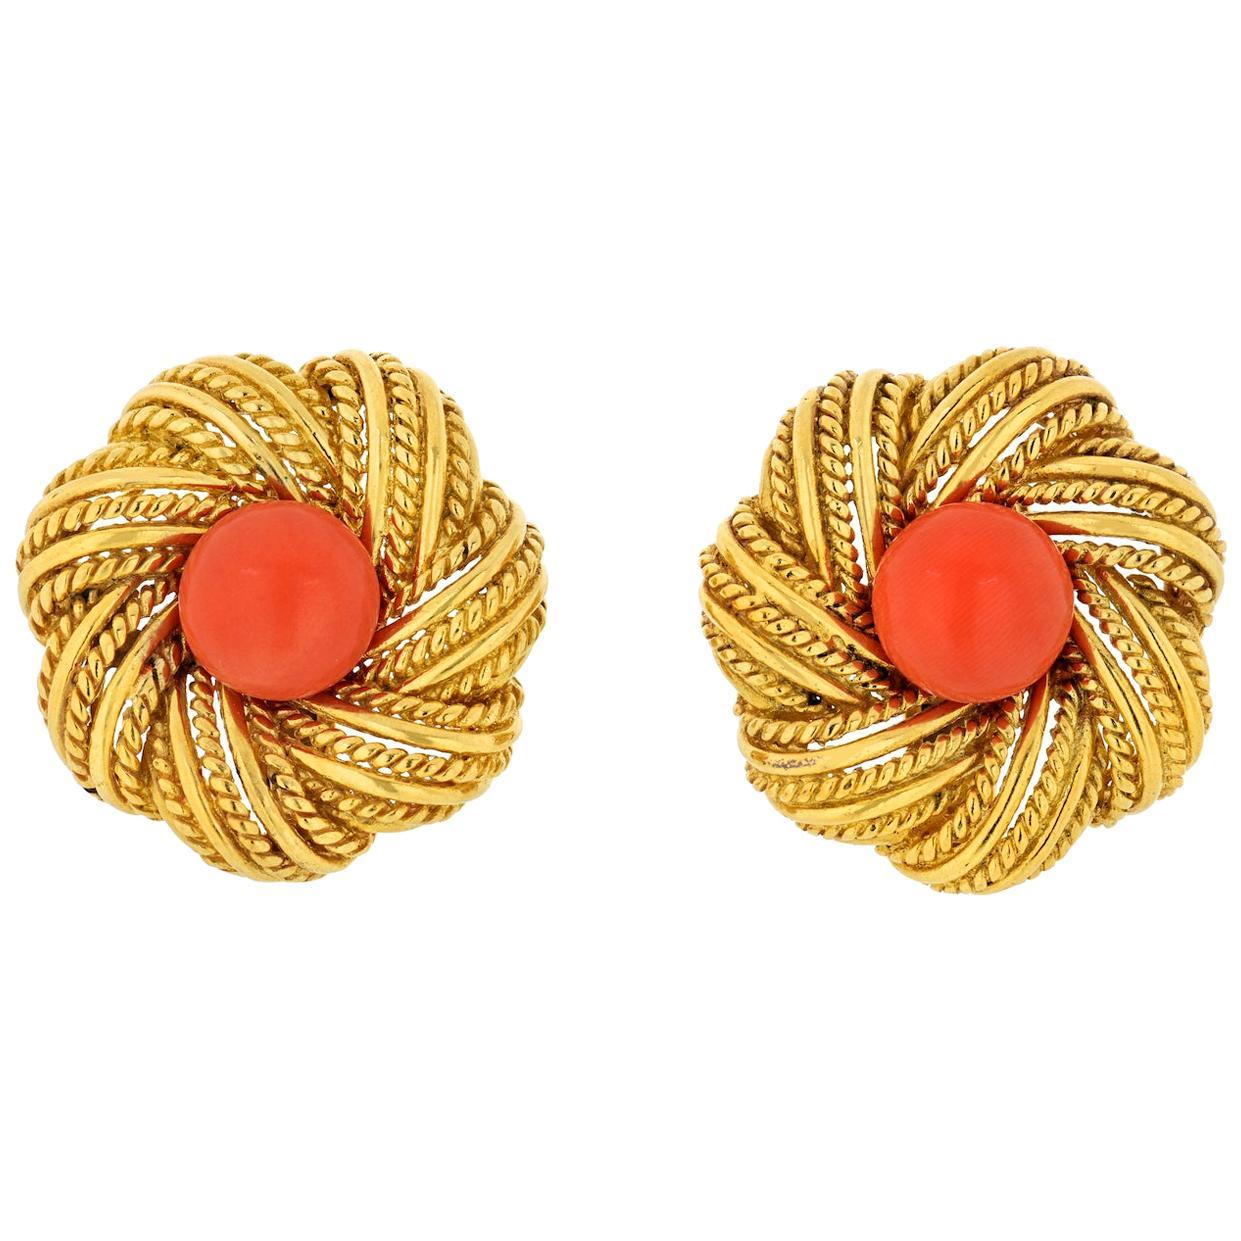 Tiffany & Co. Vintage Flower Coral Earrings